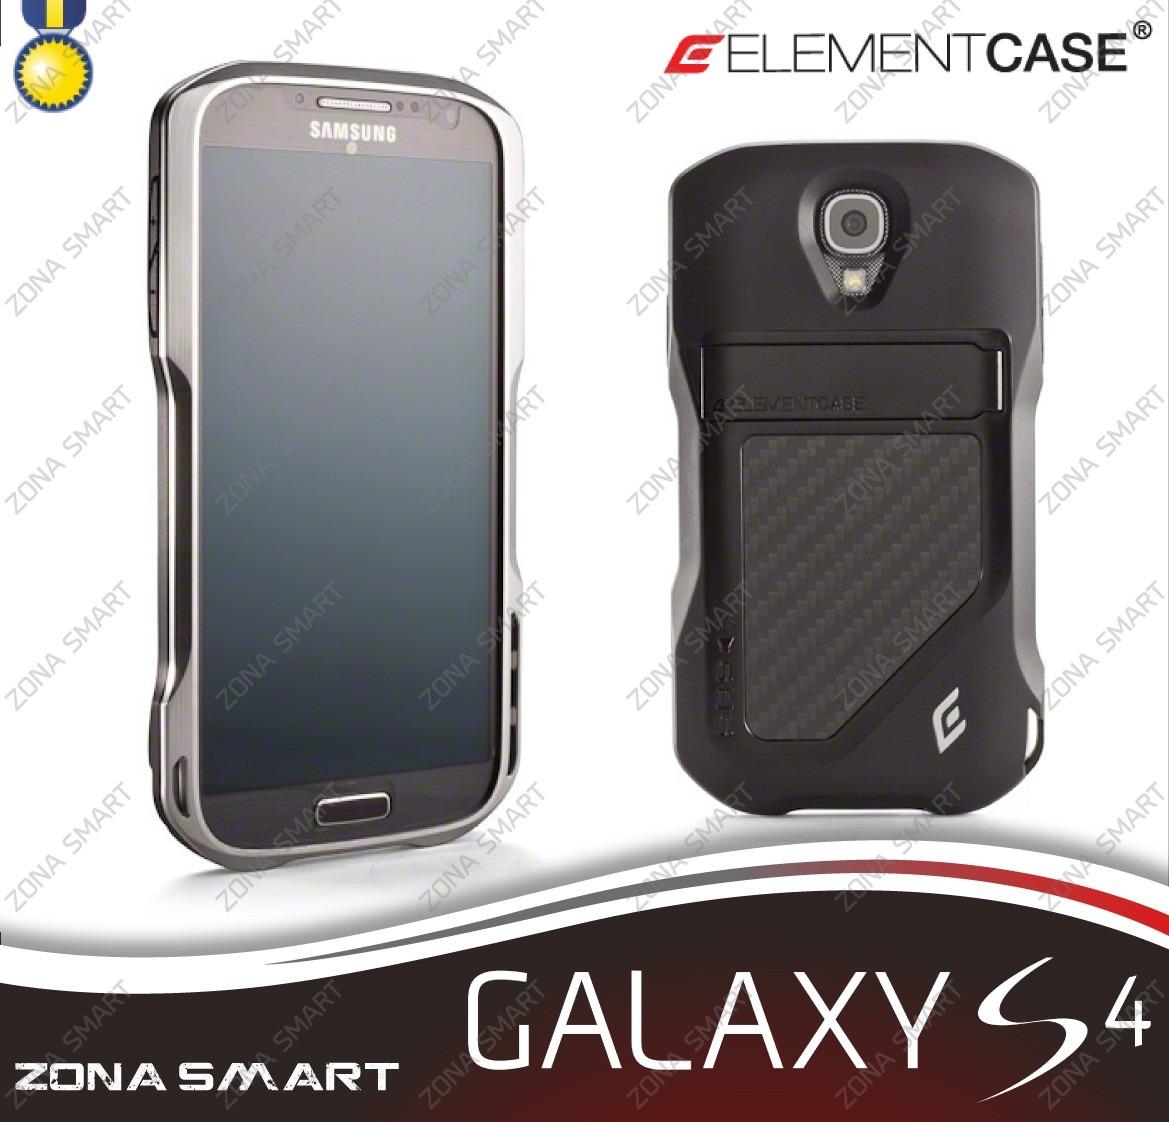 new products 903dc 436a9 Eclipse Case Samsung Galaxy S4, Element Case Aluminio Bumper